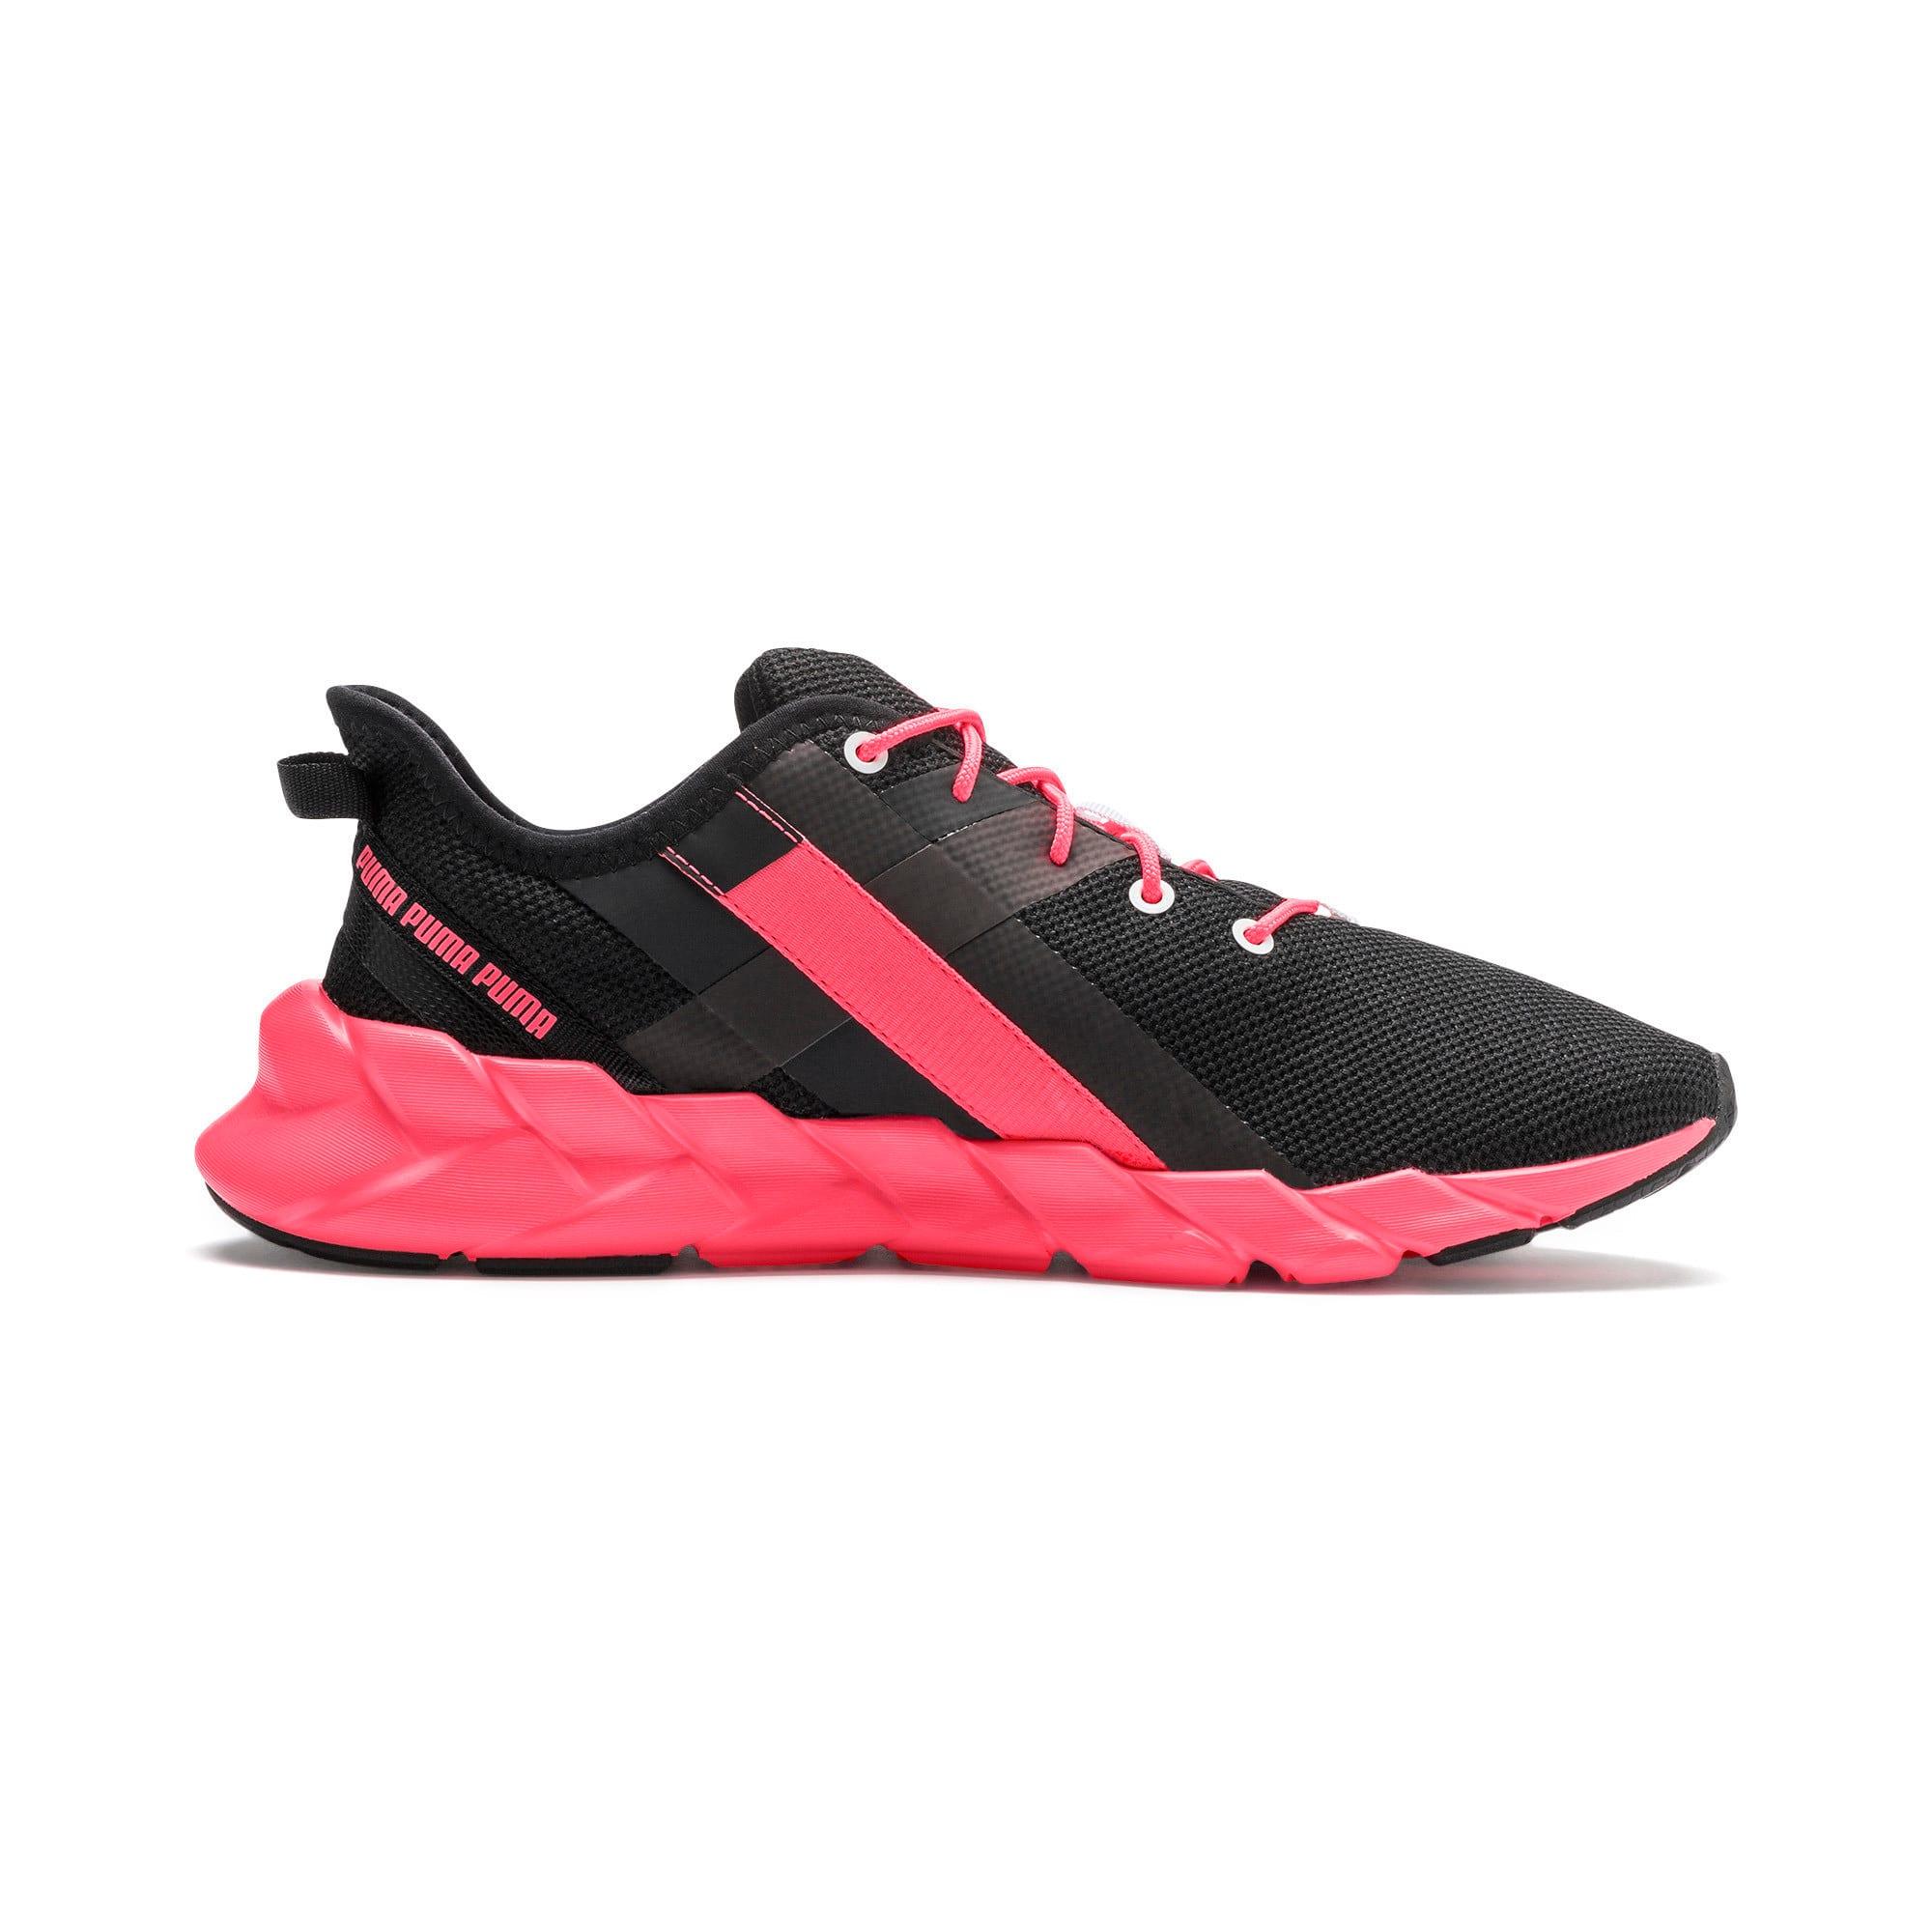 Thumbnail 6 of Weave XT Women's Training Shoes, Puma Black-Pink Alert, medium